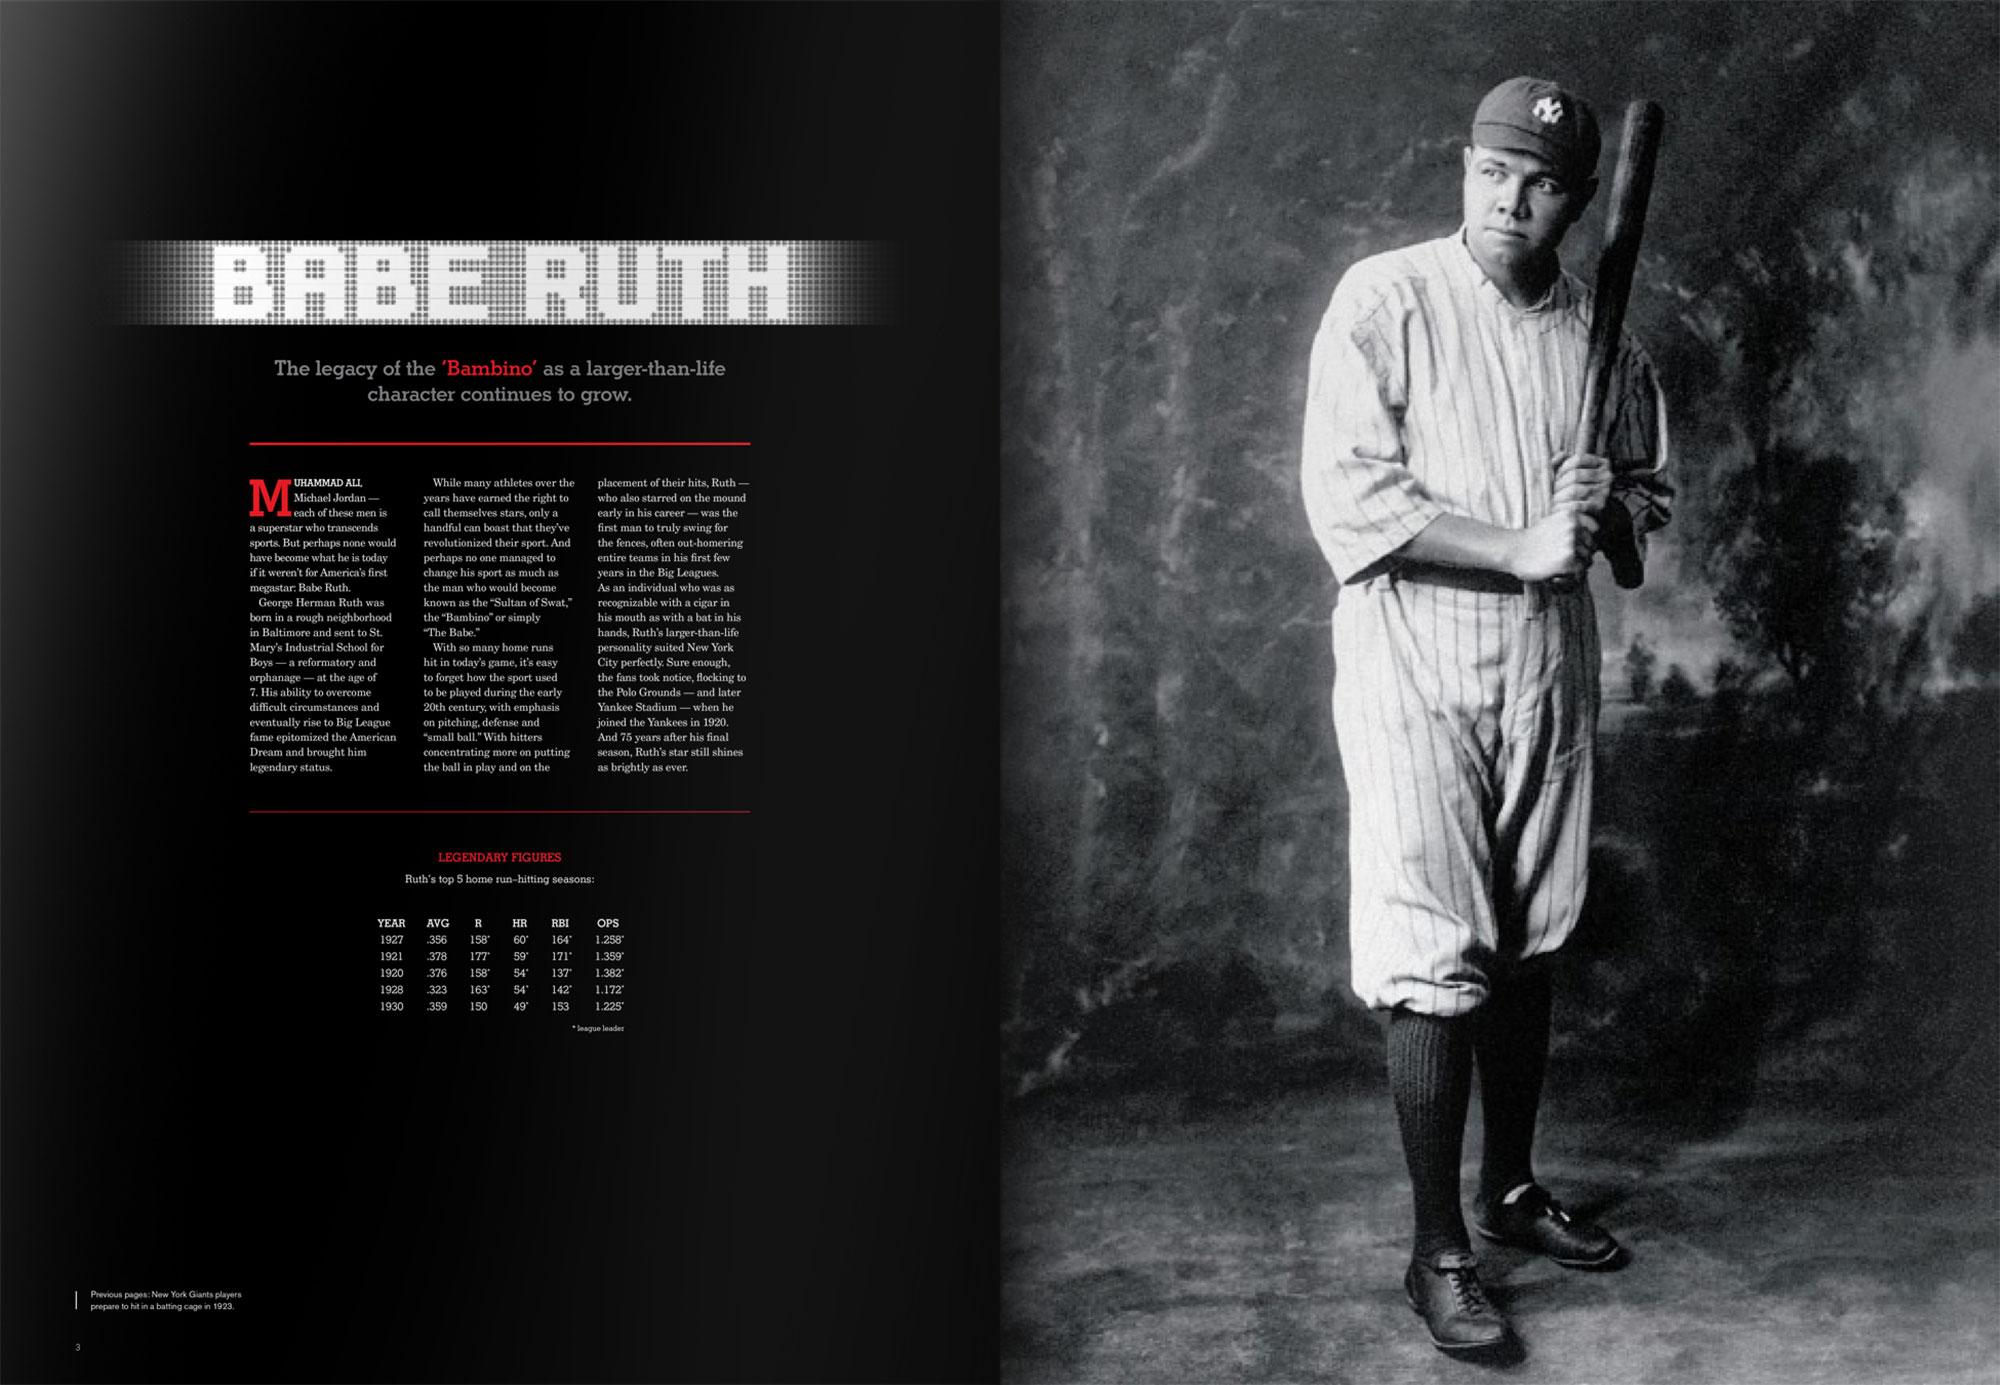 Babe Ruth profile